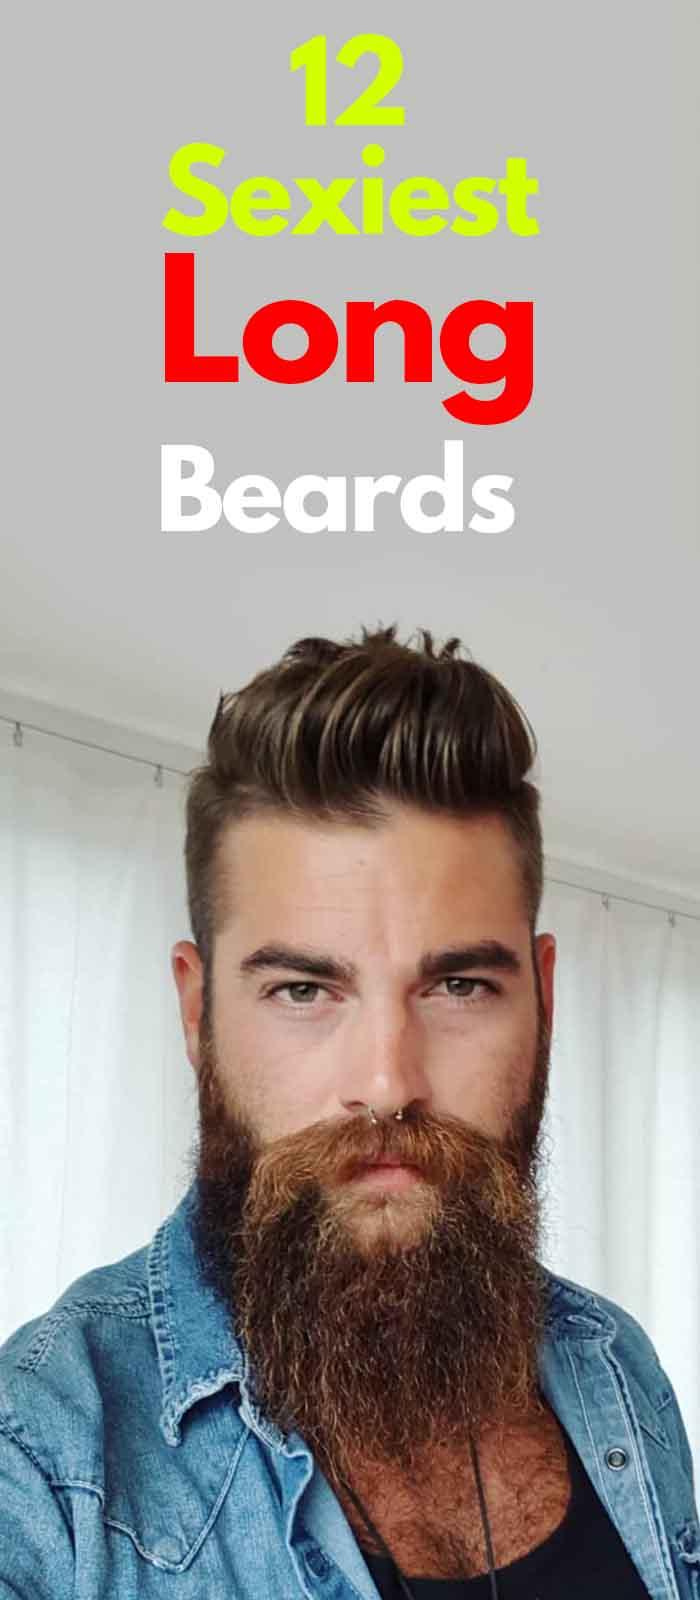 Long Beard Style for men Modern Gentlemen!